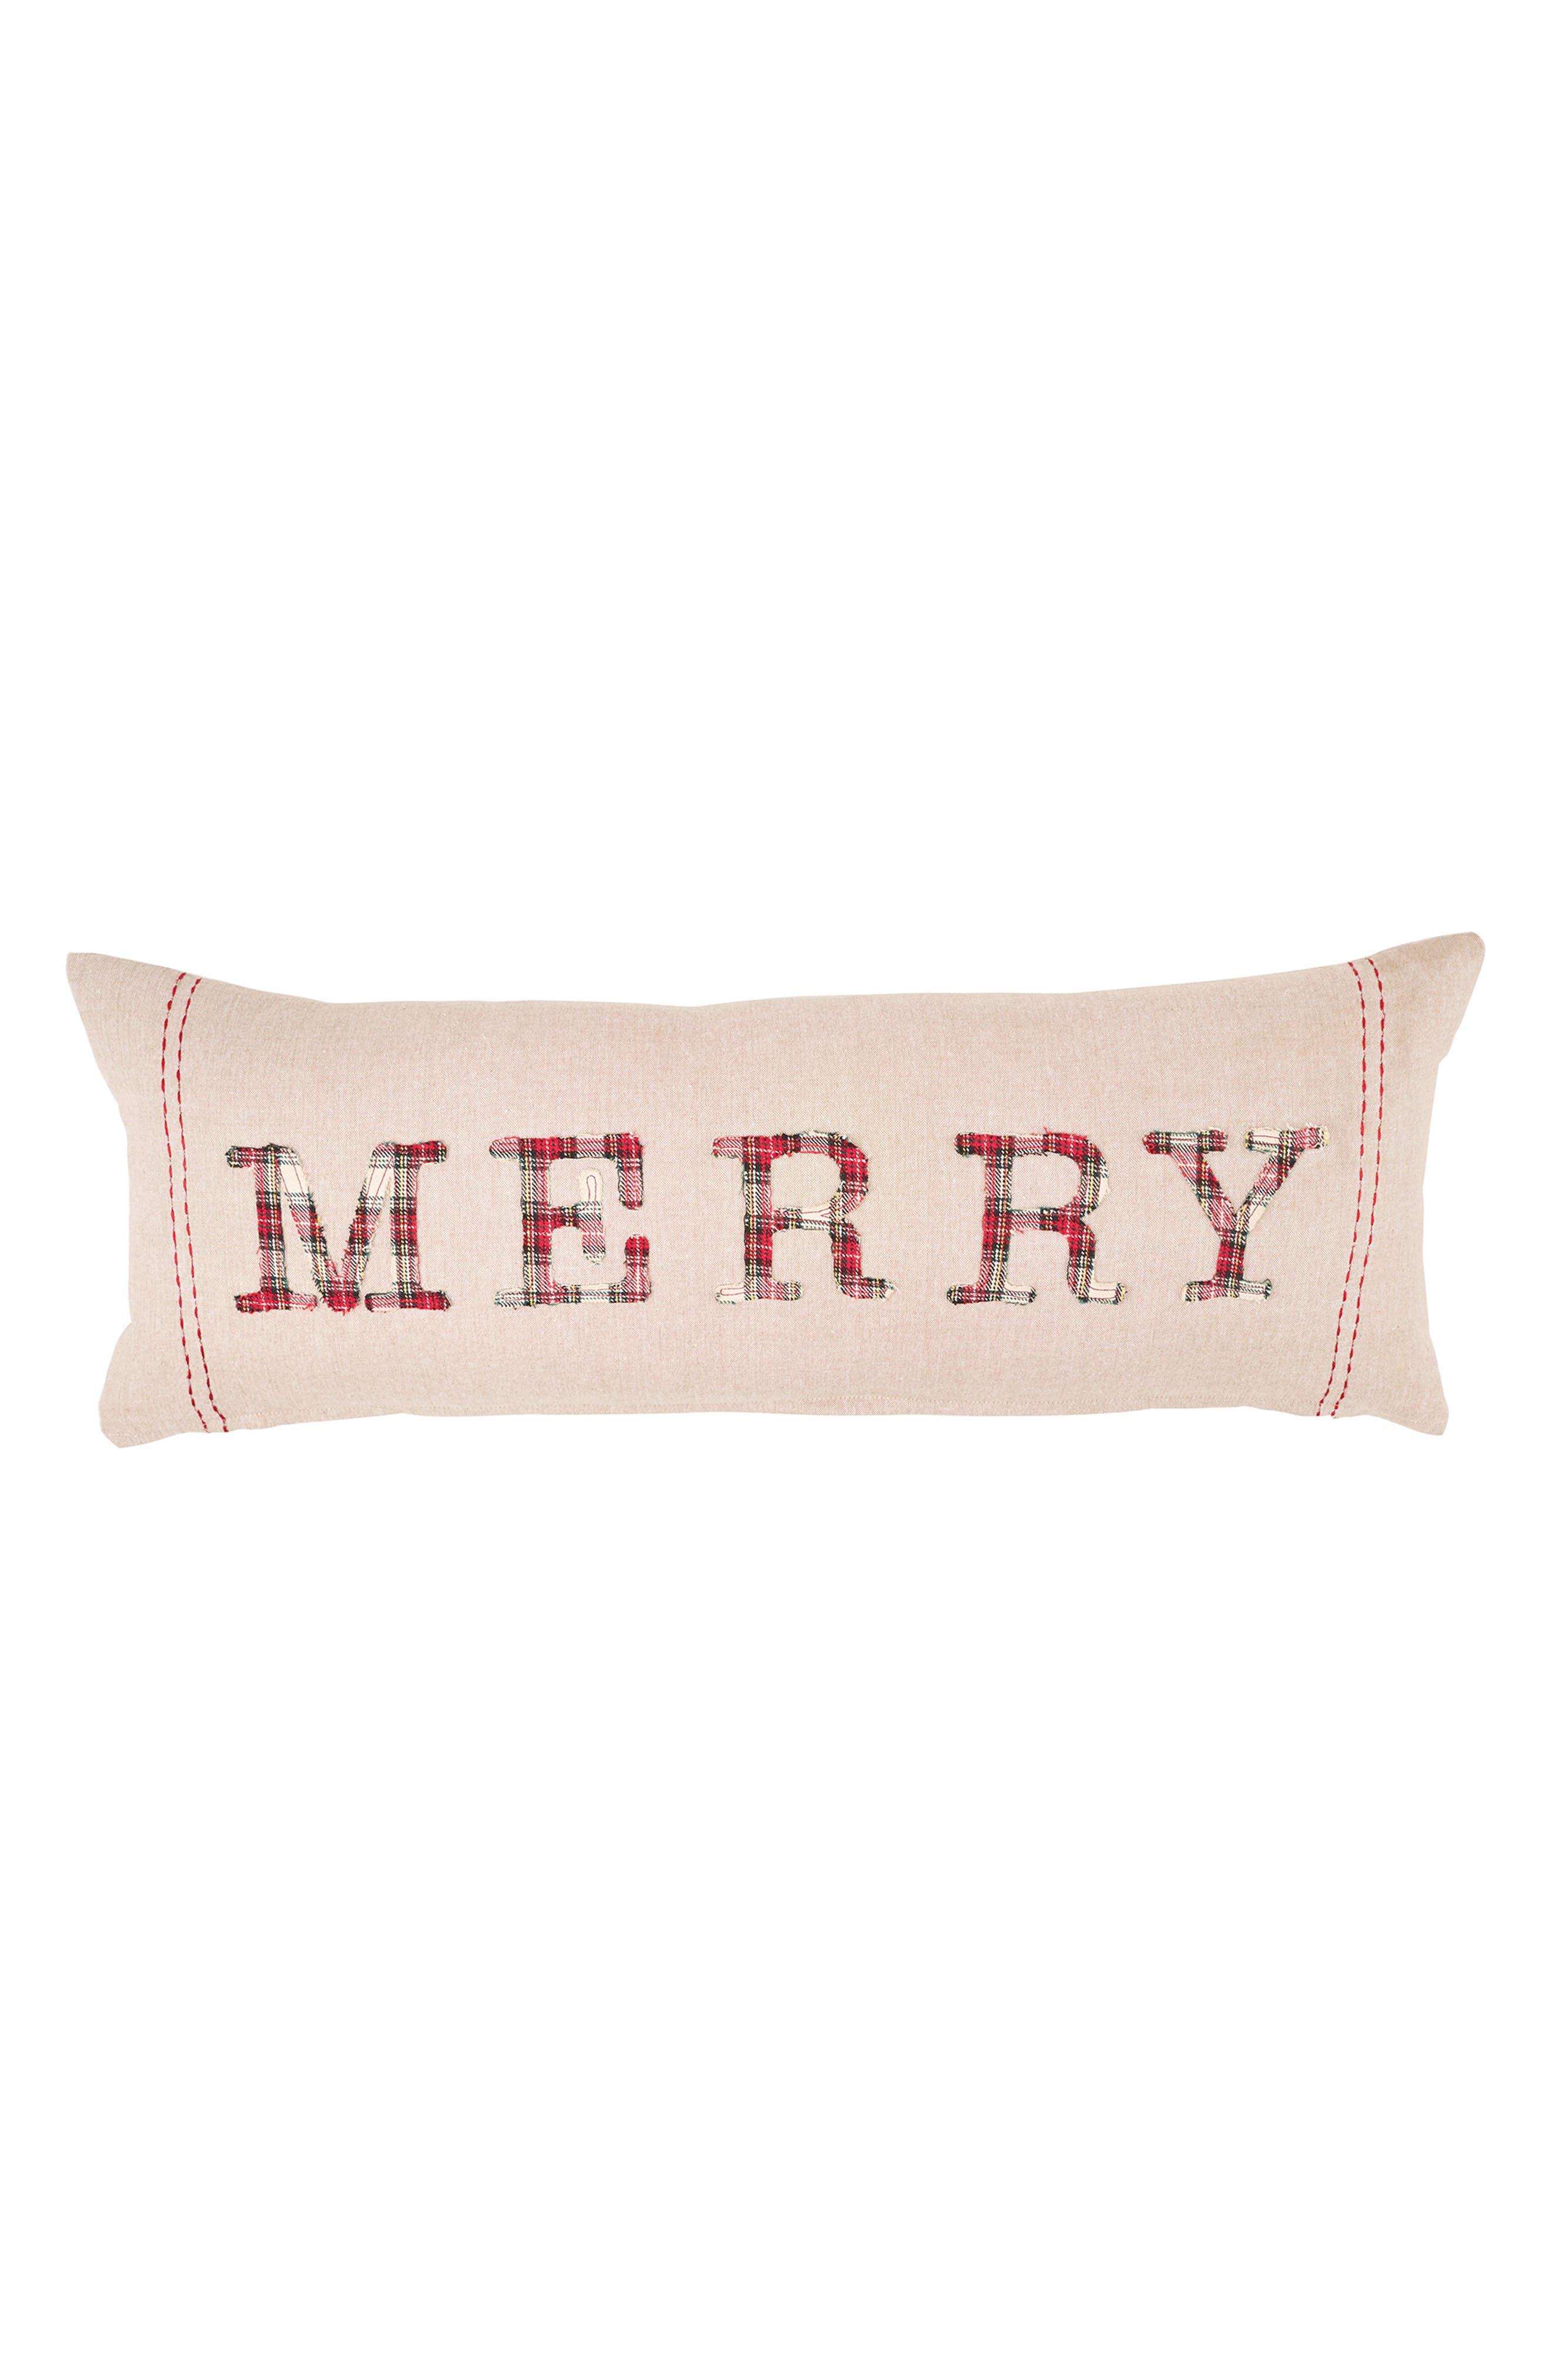 Merry Tartan Appliqué Accent Pillow,                         Main,                         color, 250